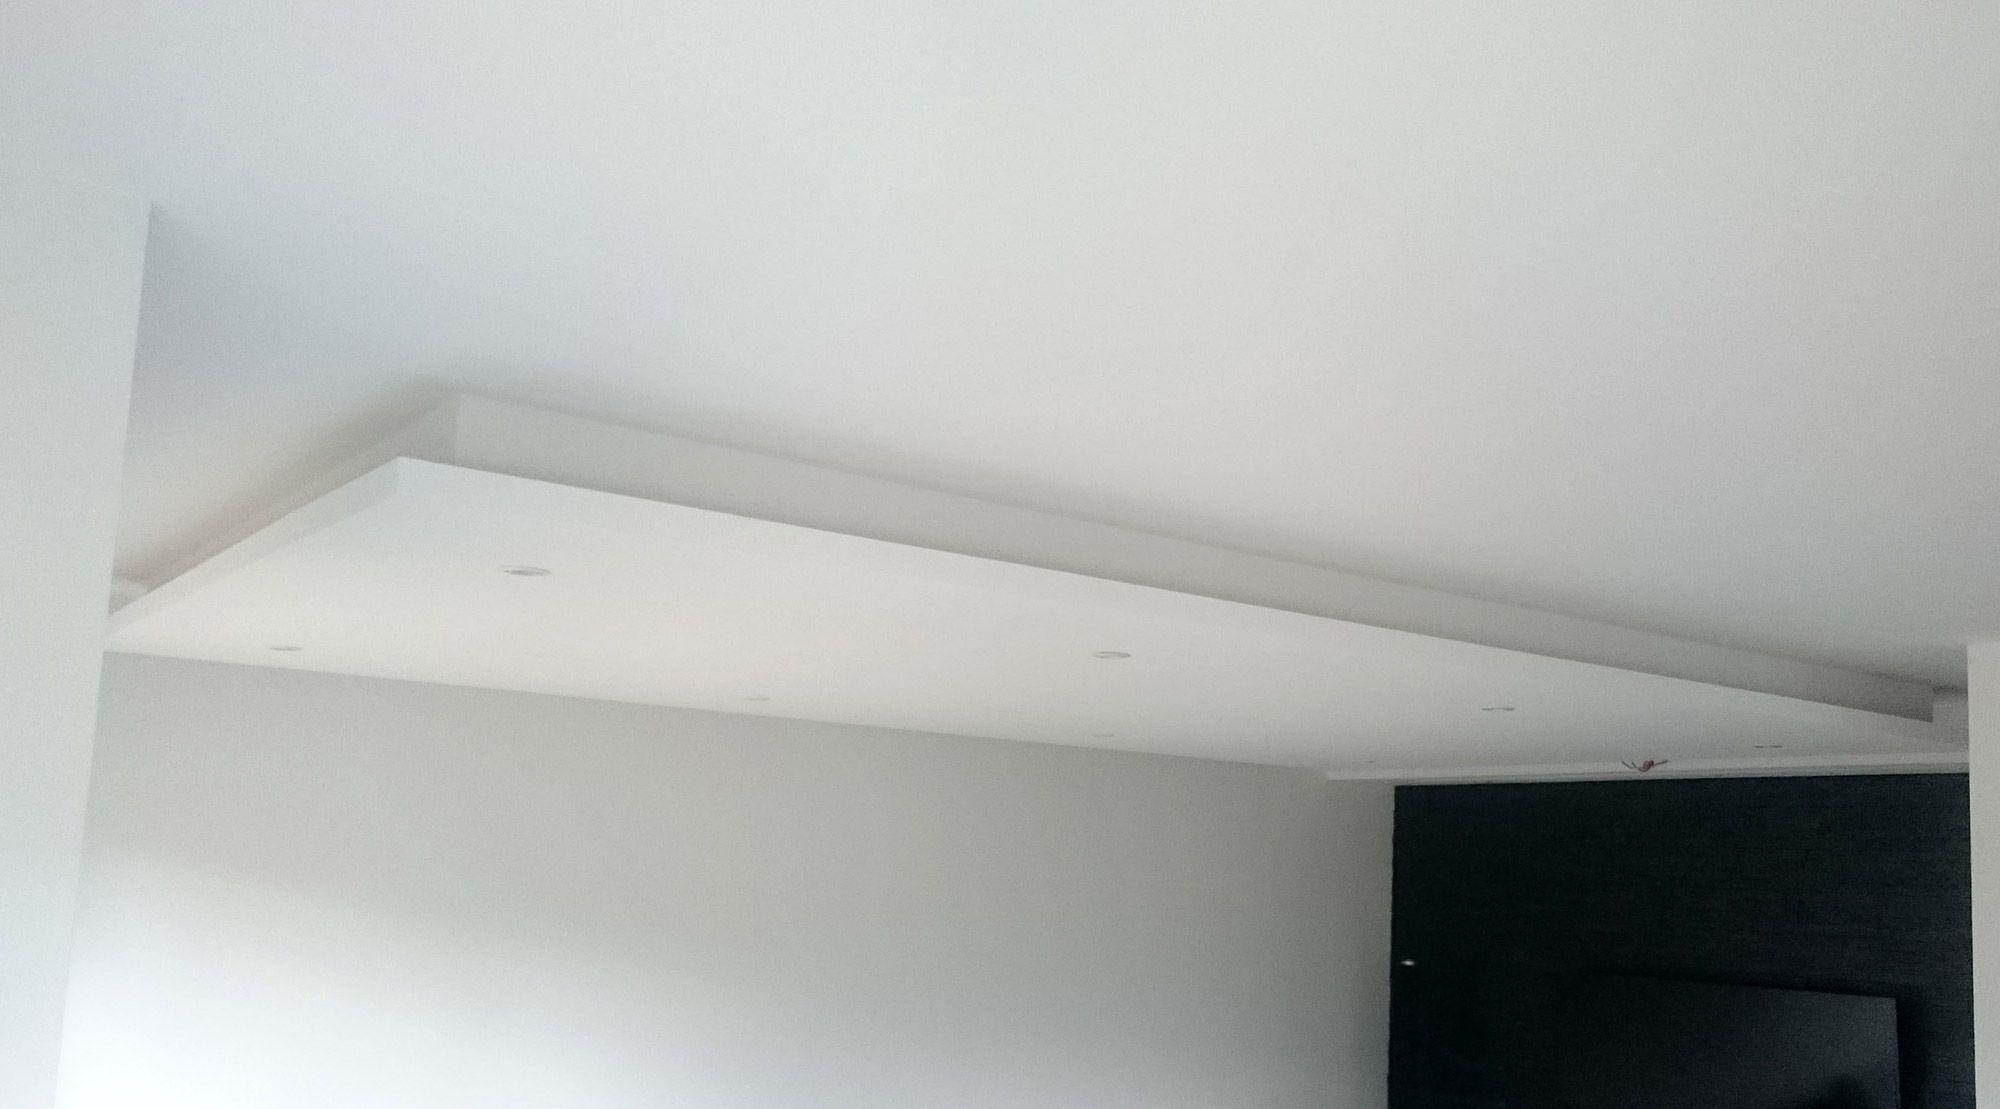 indirekte beleuchtung abgehängte decke anregungen abbild der fabdbbefaa